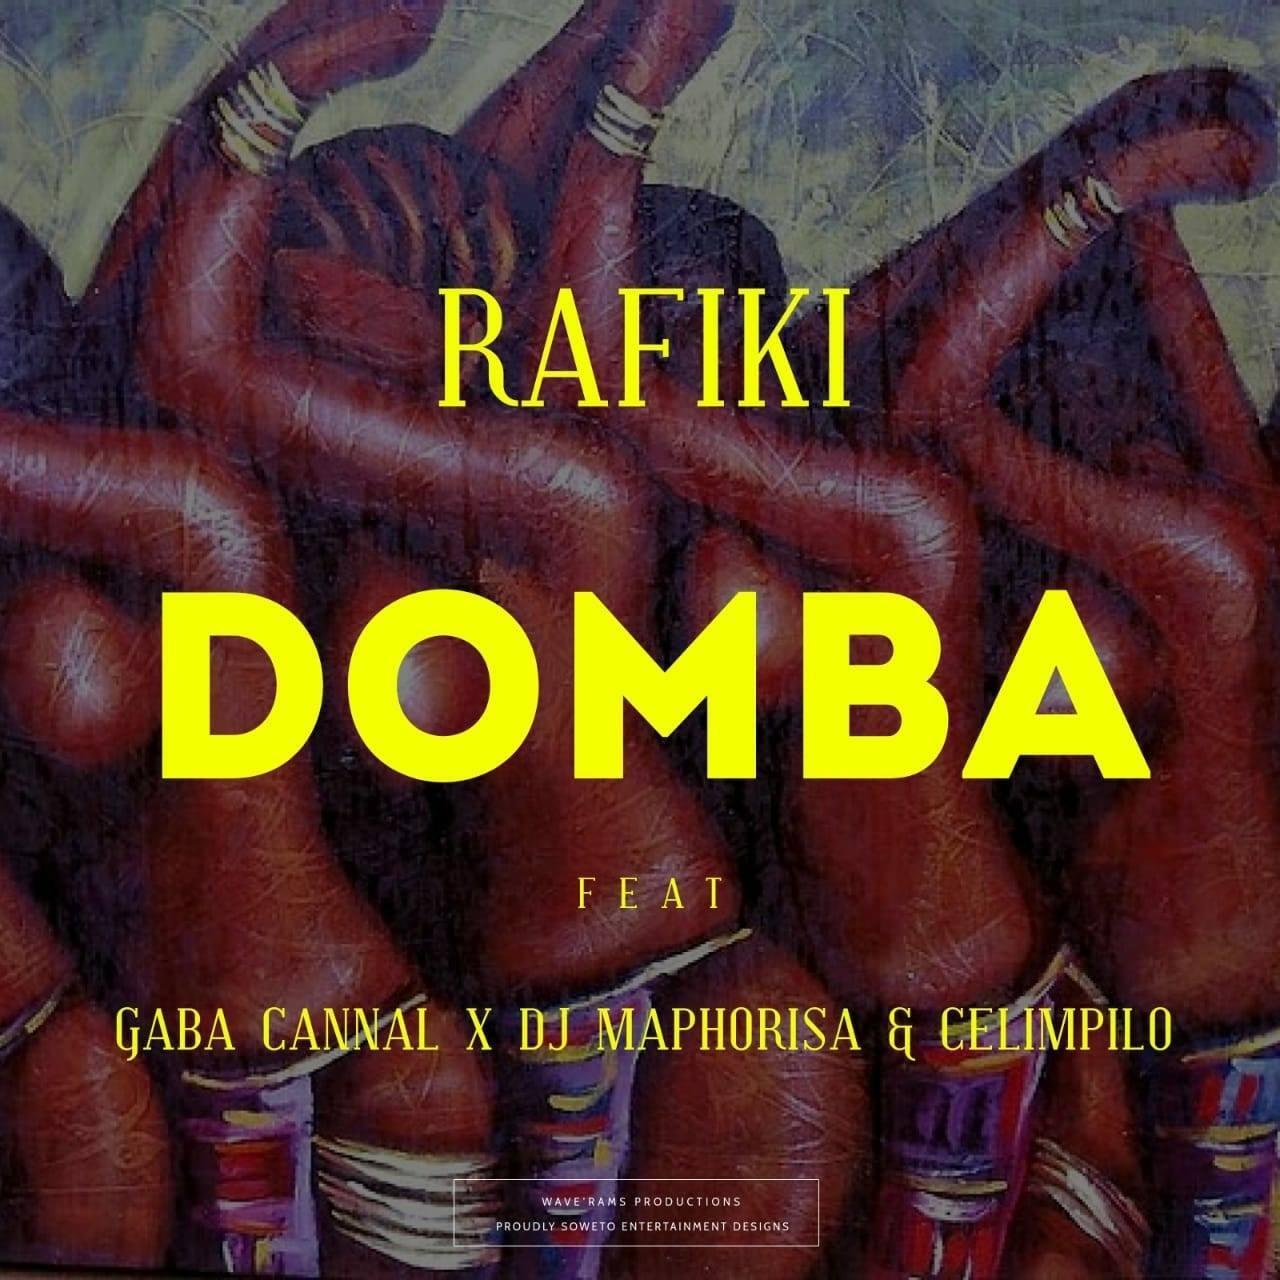 Rafiki Ft. Gaba Cannal, DJ Maphorisa e Celimpilo - Domba